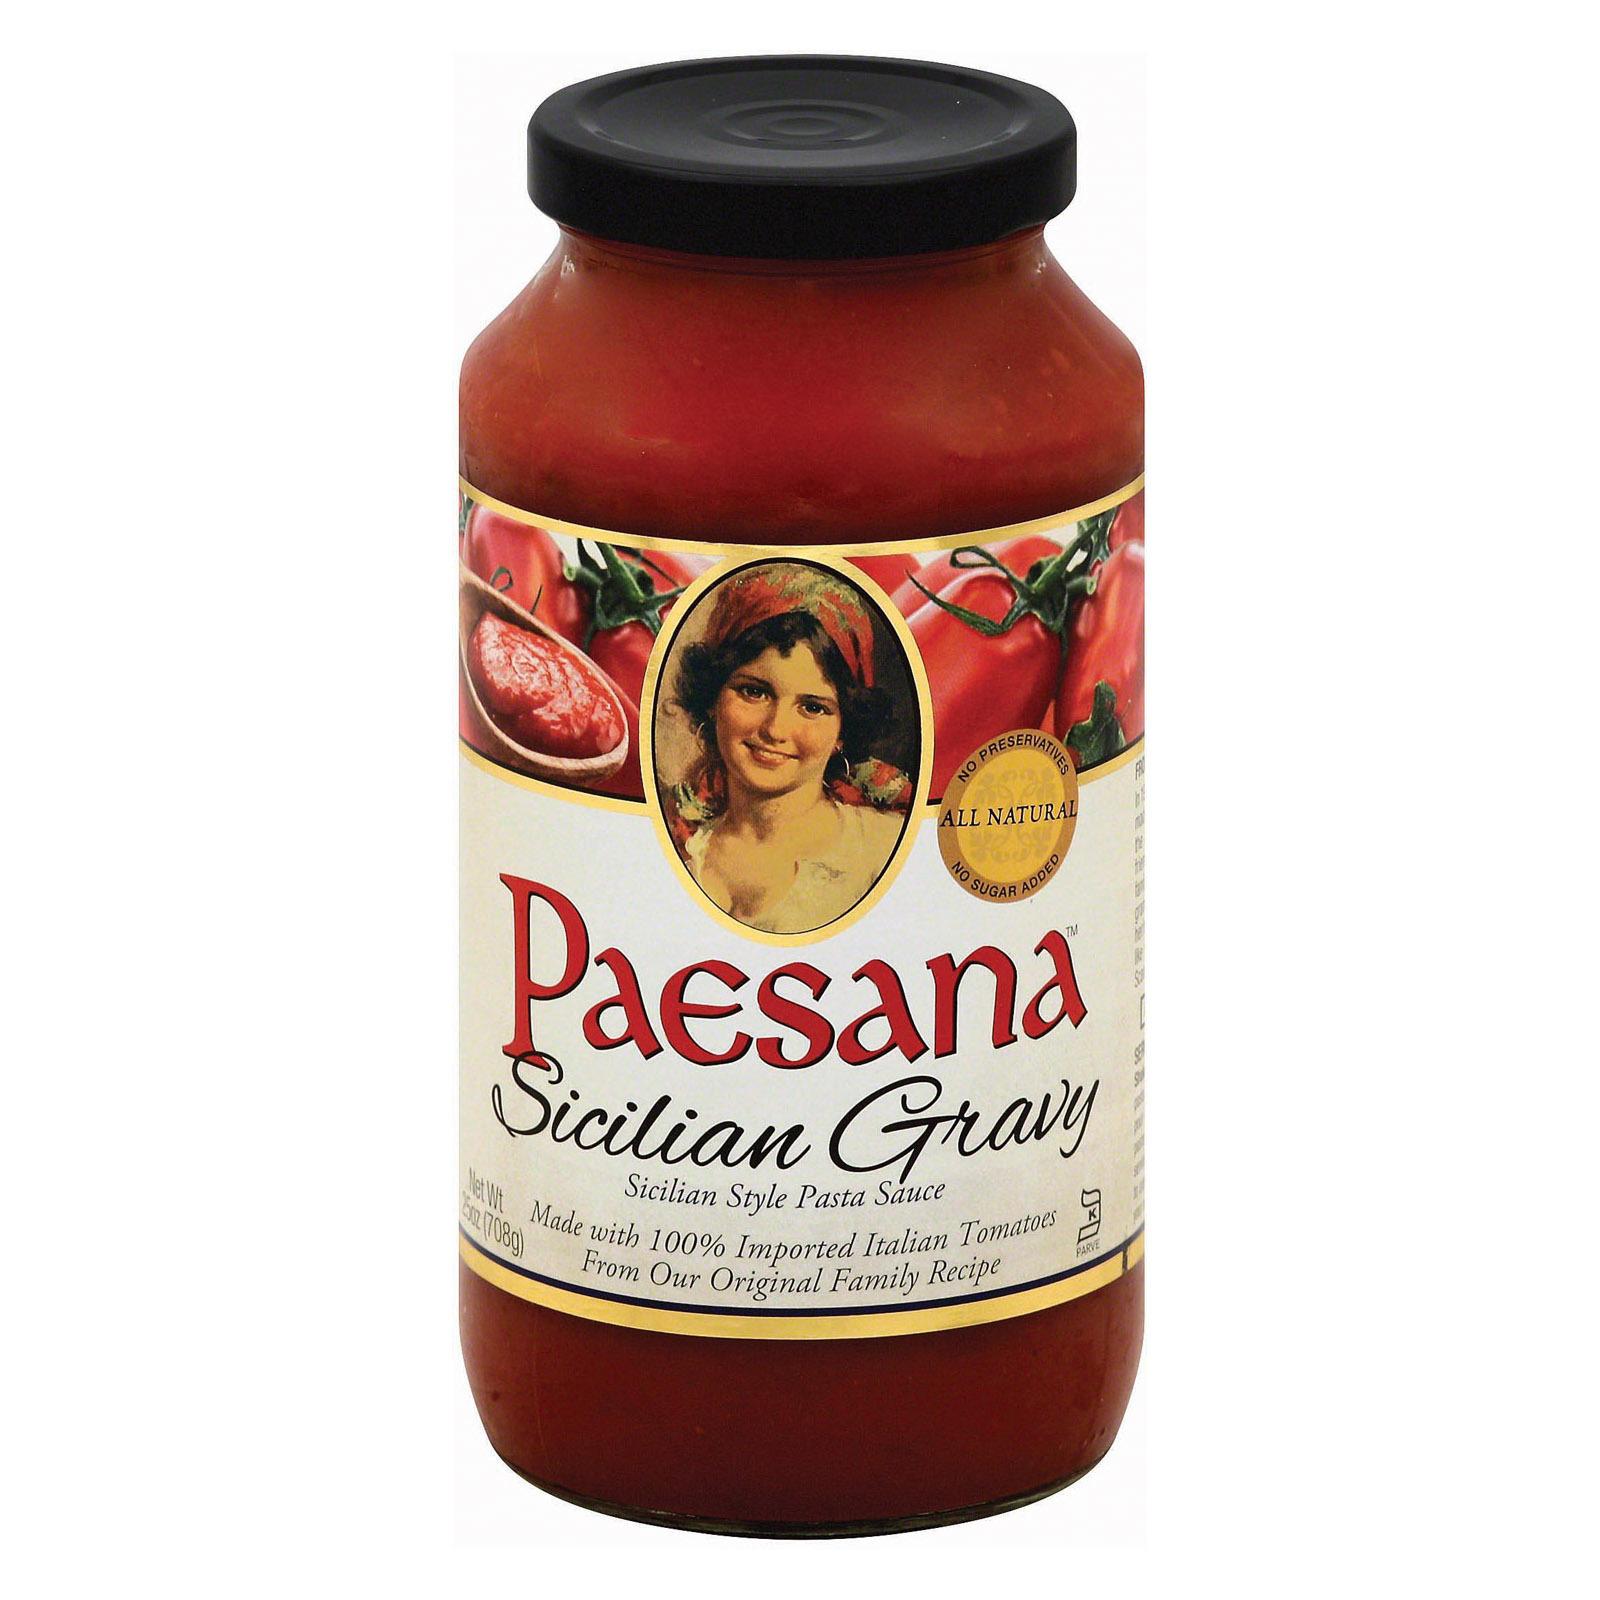 Paesana Sicilian Gravy Sauce - Tomato - Case of 6 - 25 Fl oz.